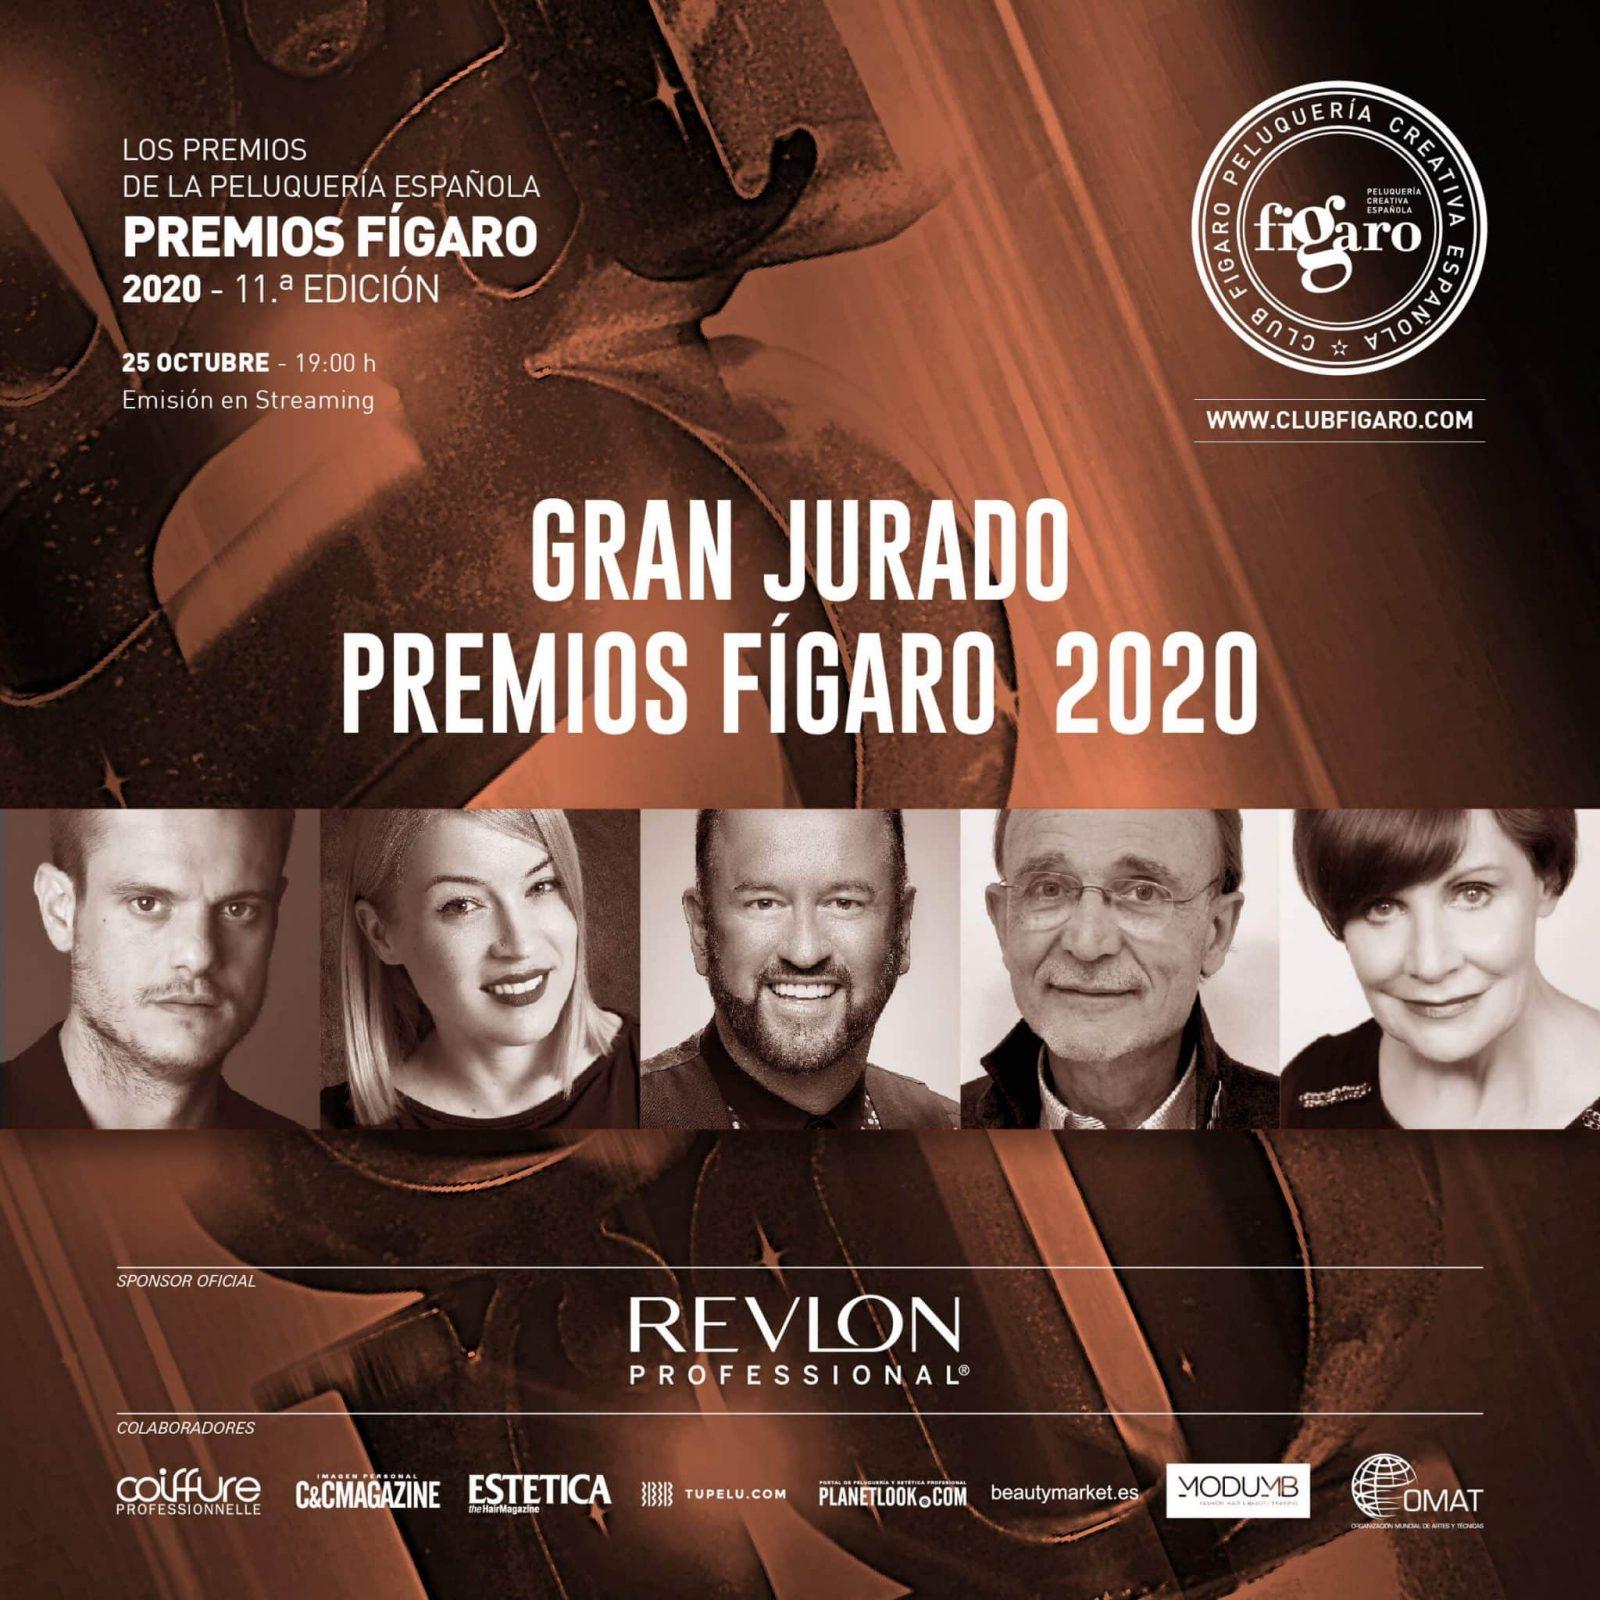 Jurado Profesional Premios Figaro 2020 Insta 1 1